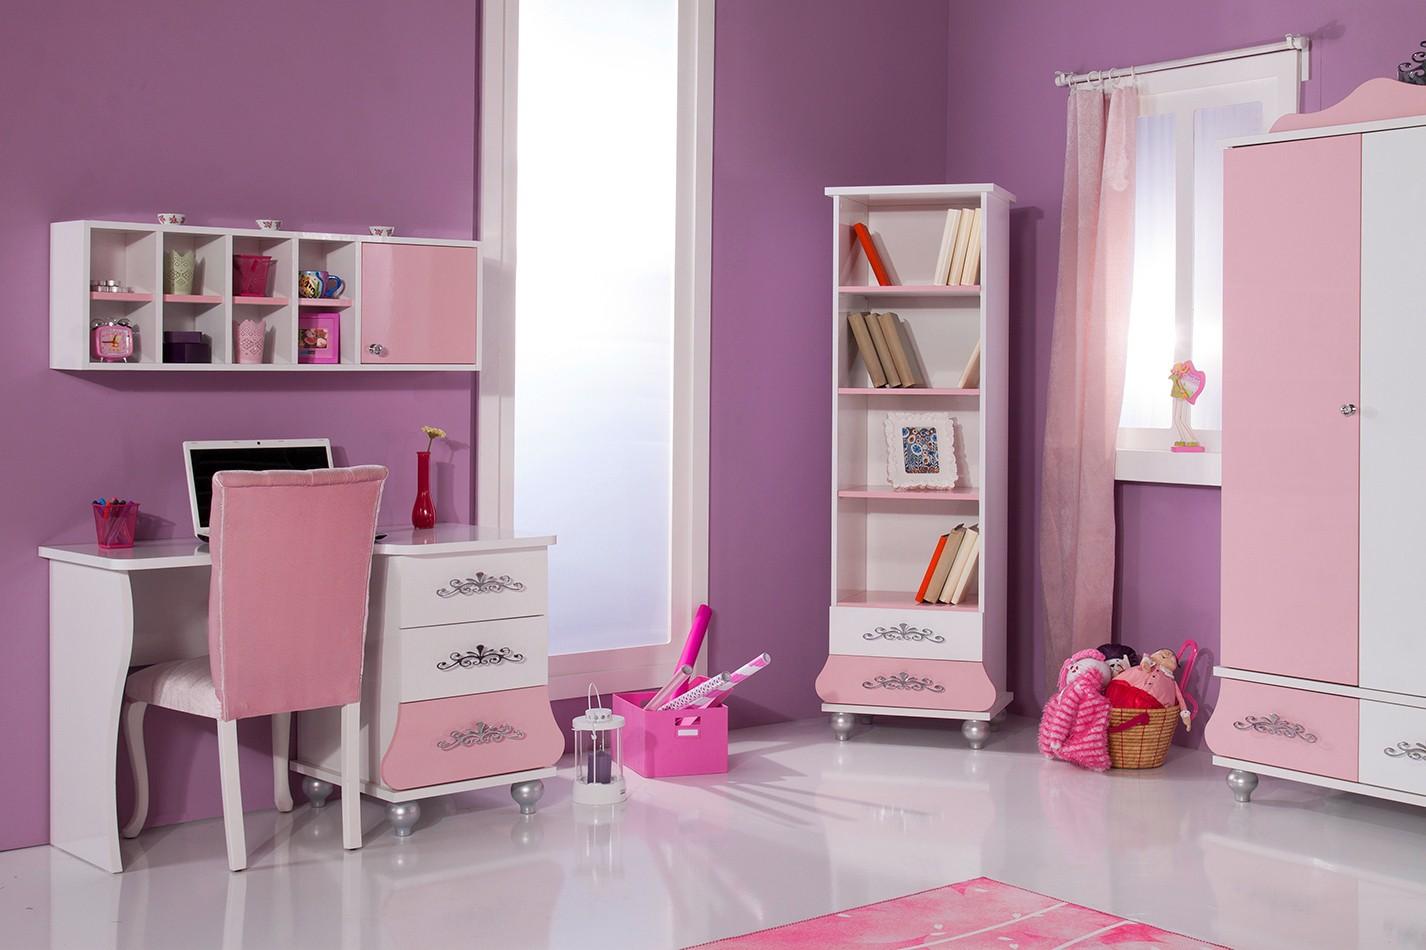 Prinses stoel roze koop je bij huis en tuinwereld kinderkamer kinderbed terrashaard en barbecues - Roze kinderkamer ...